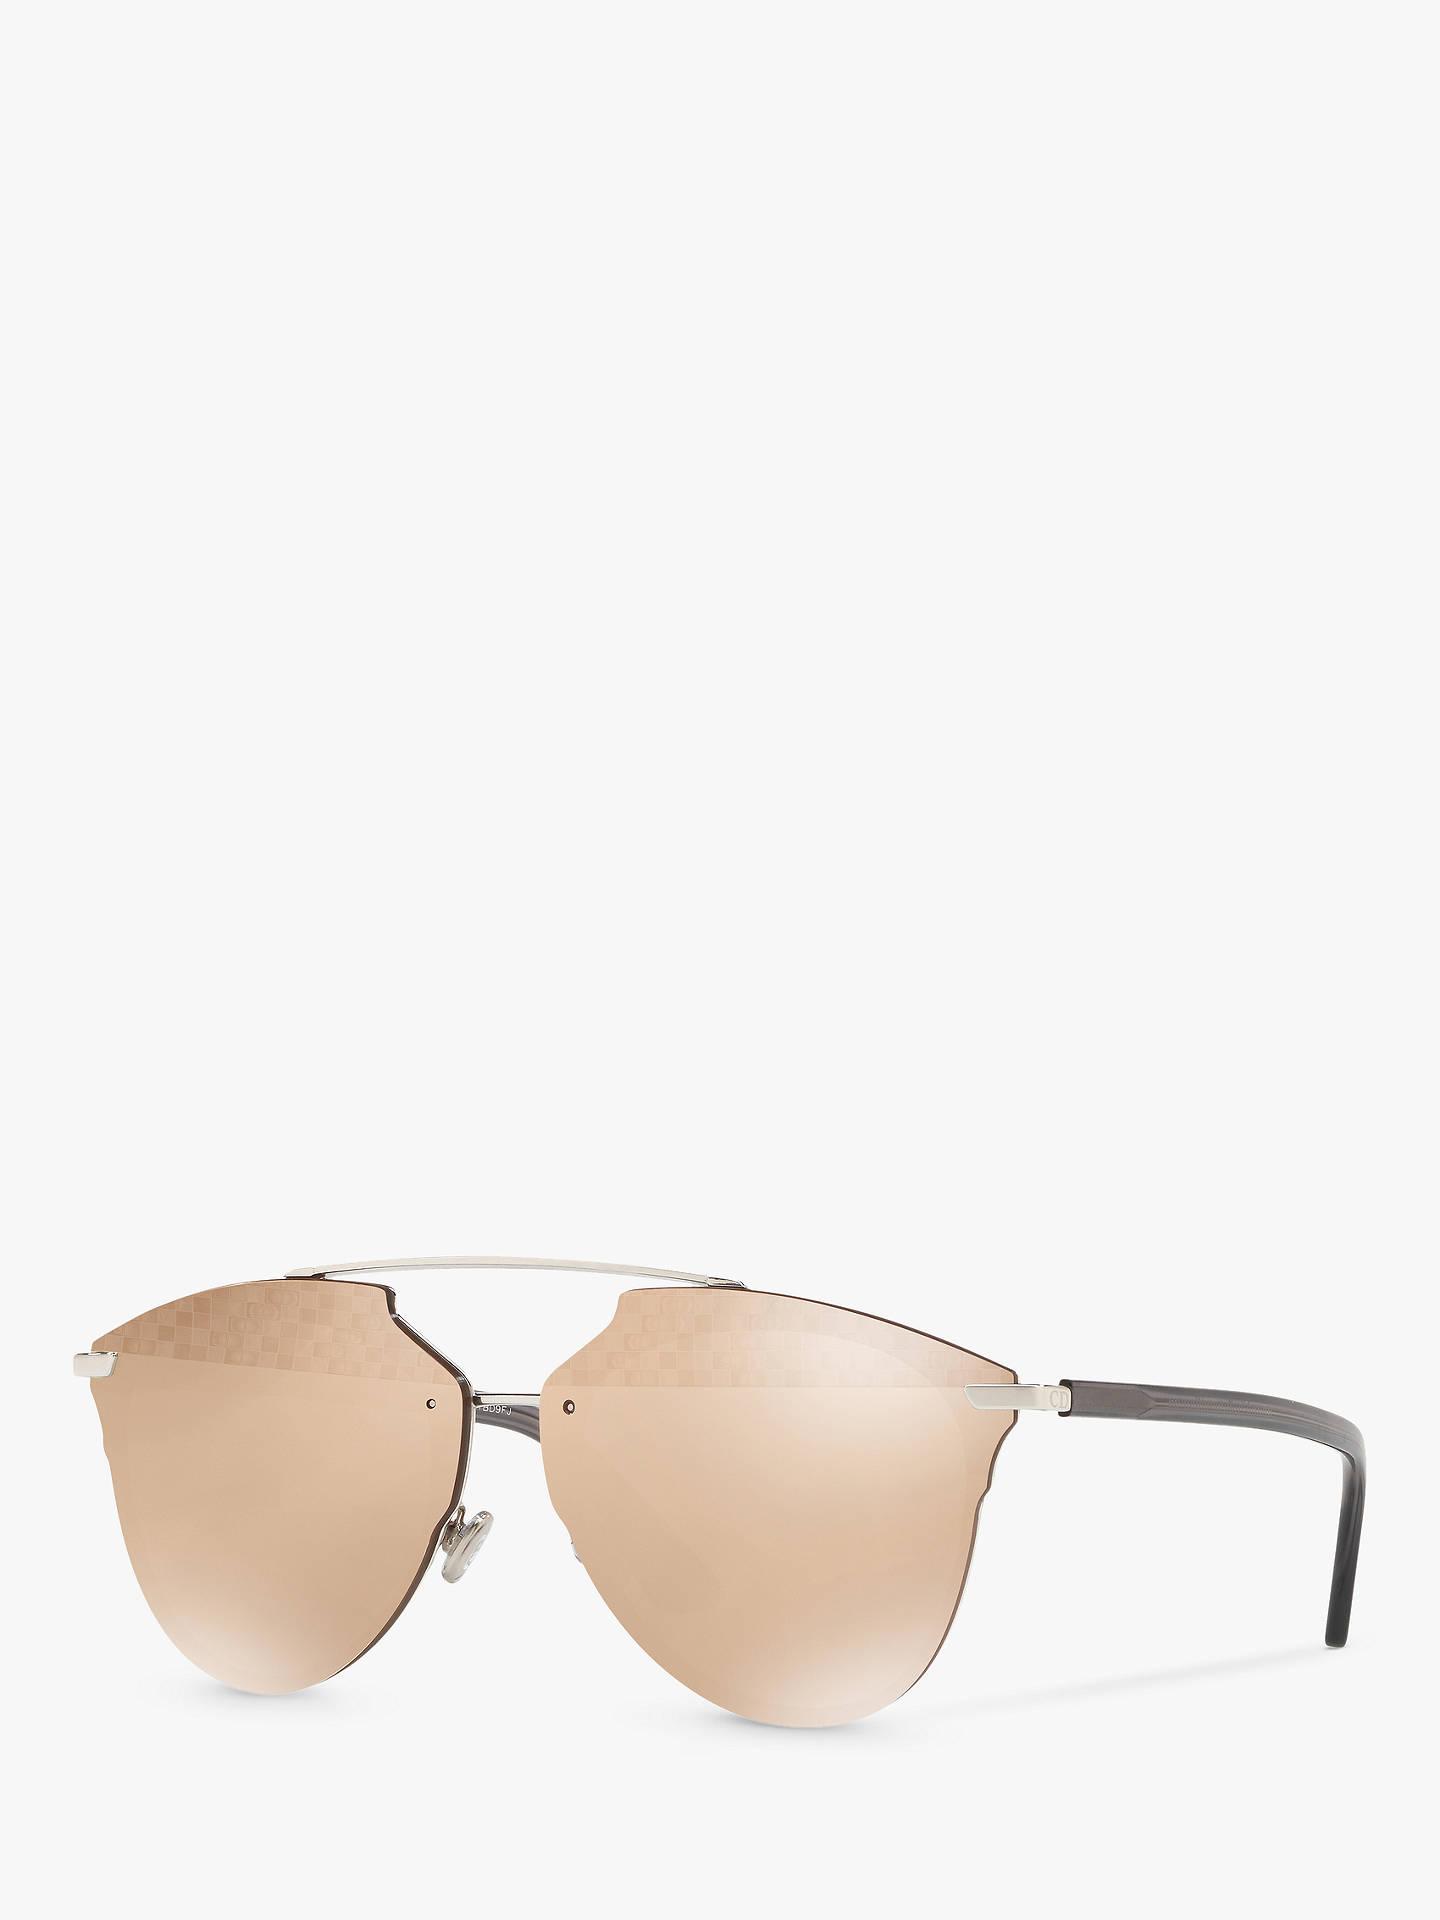 8aa0596cb7bb Buy Dior DiorReflectedP Geometric Sunglasses, Silver/Mirror Gold Online at  johnlewis.com ...